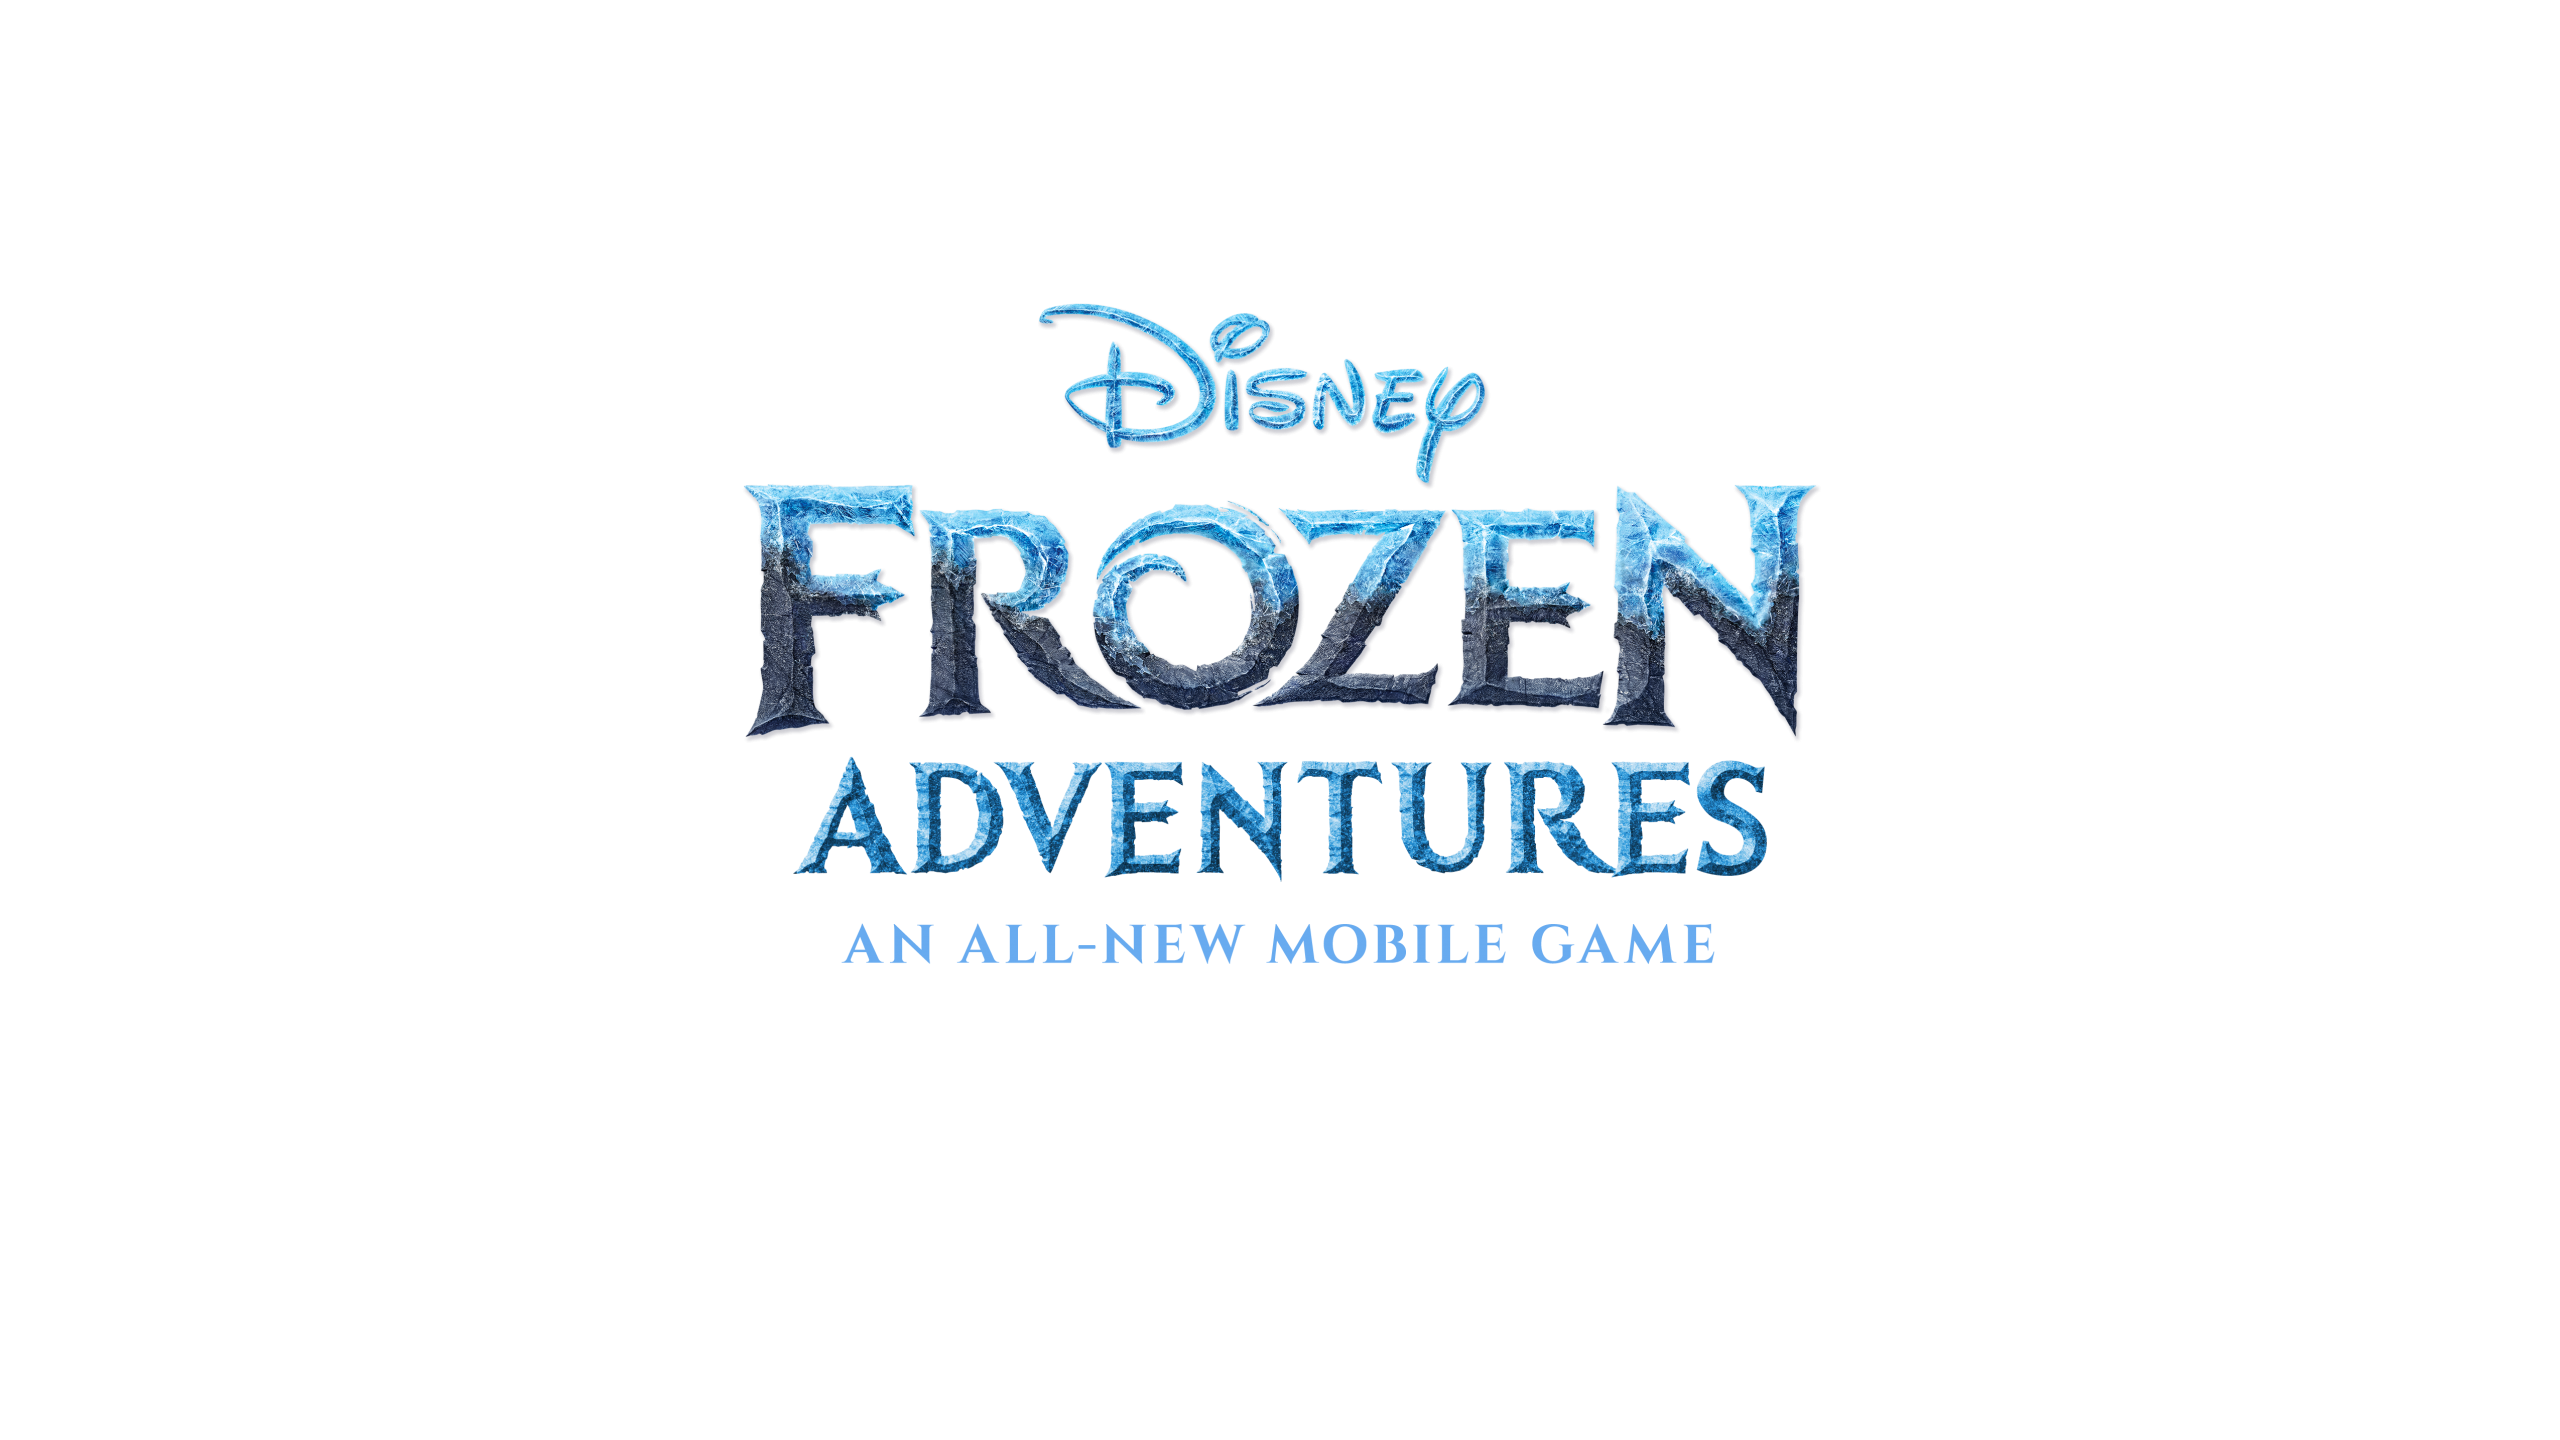 Disney Frozen Adventures logo